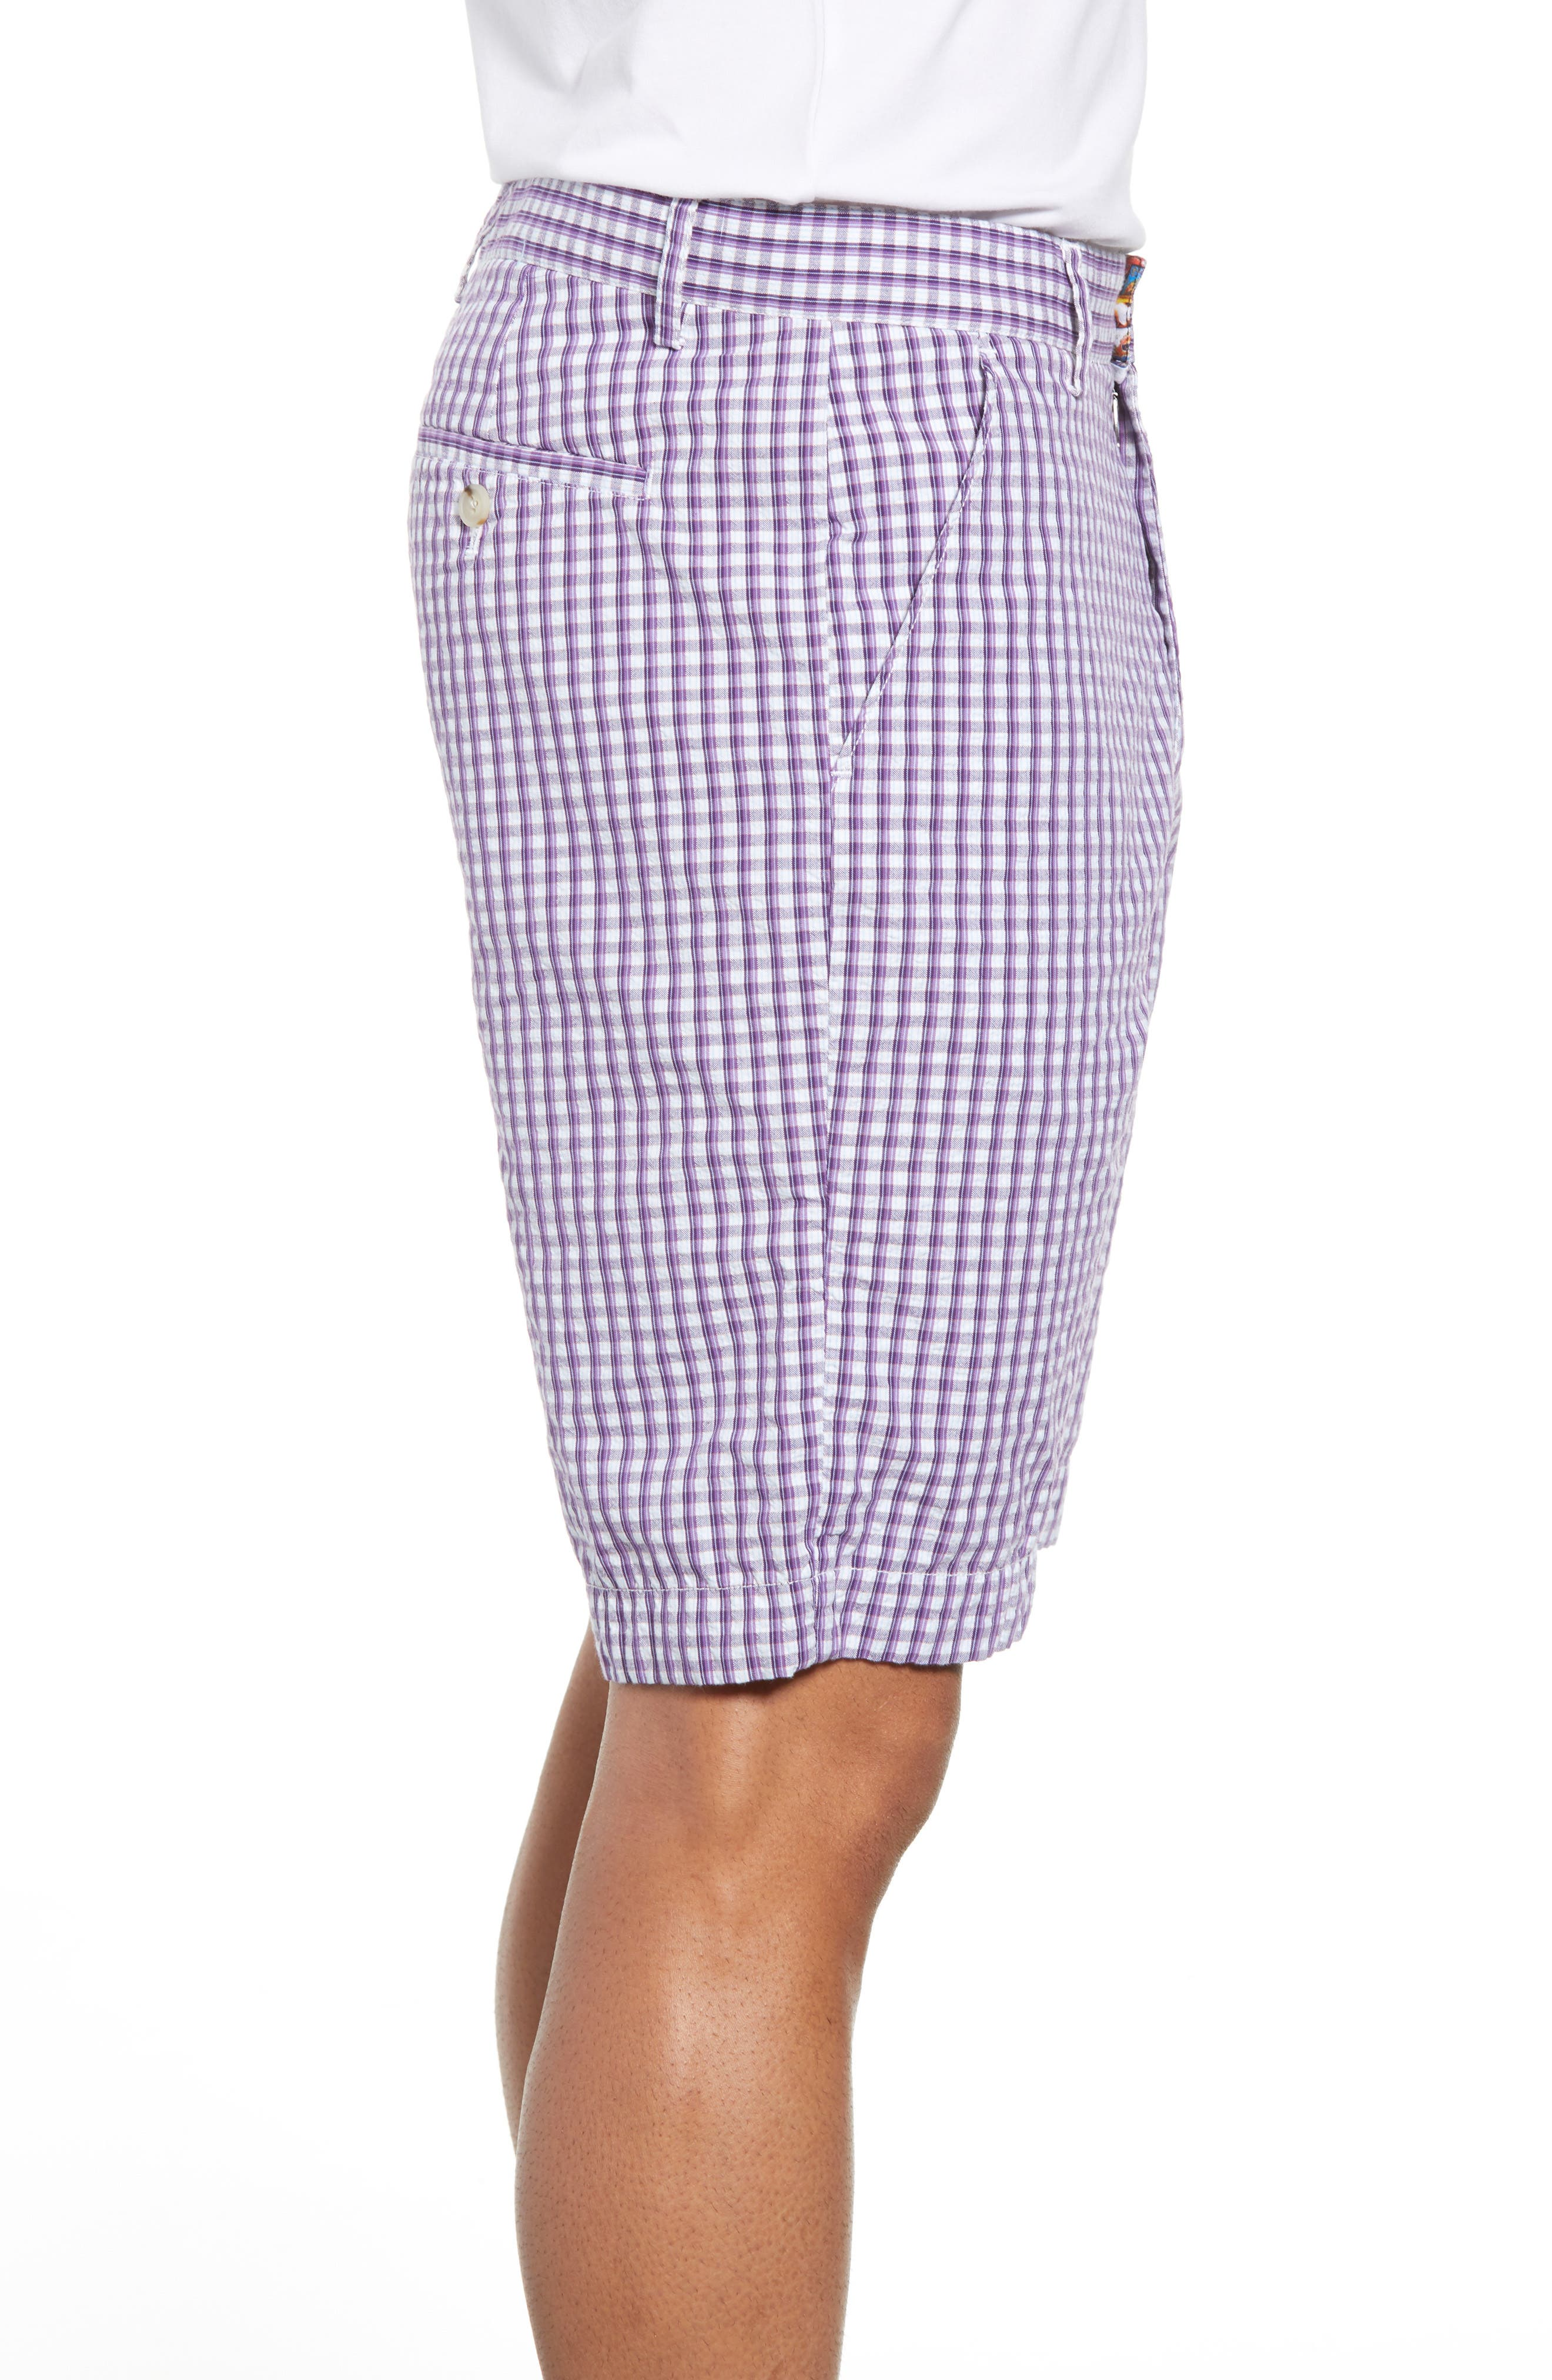 Melendez Classic Fit Shorts,                             Alternate thumbnail 3, color,                             RED